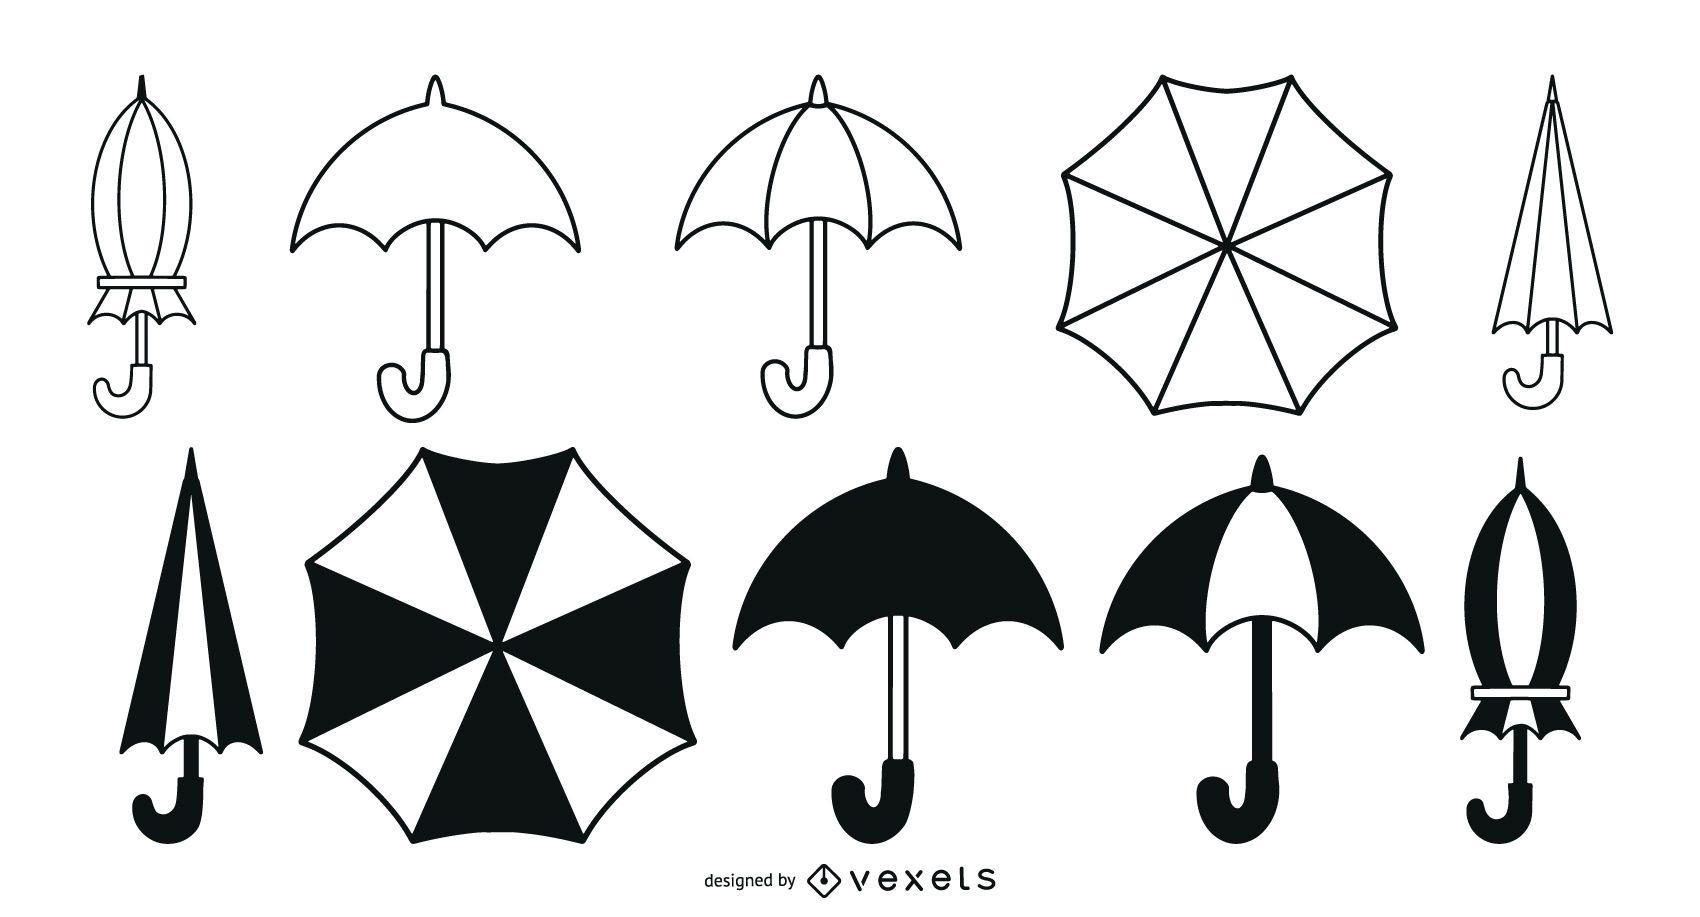 Umbrellas stroke pack